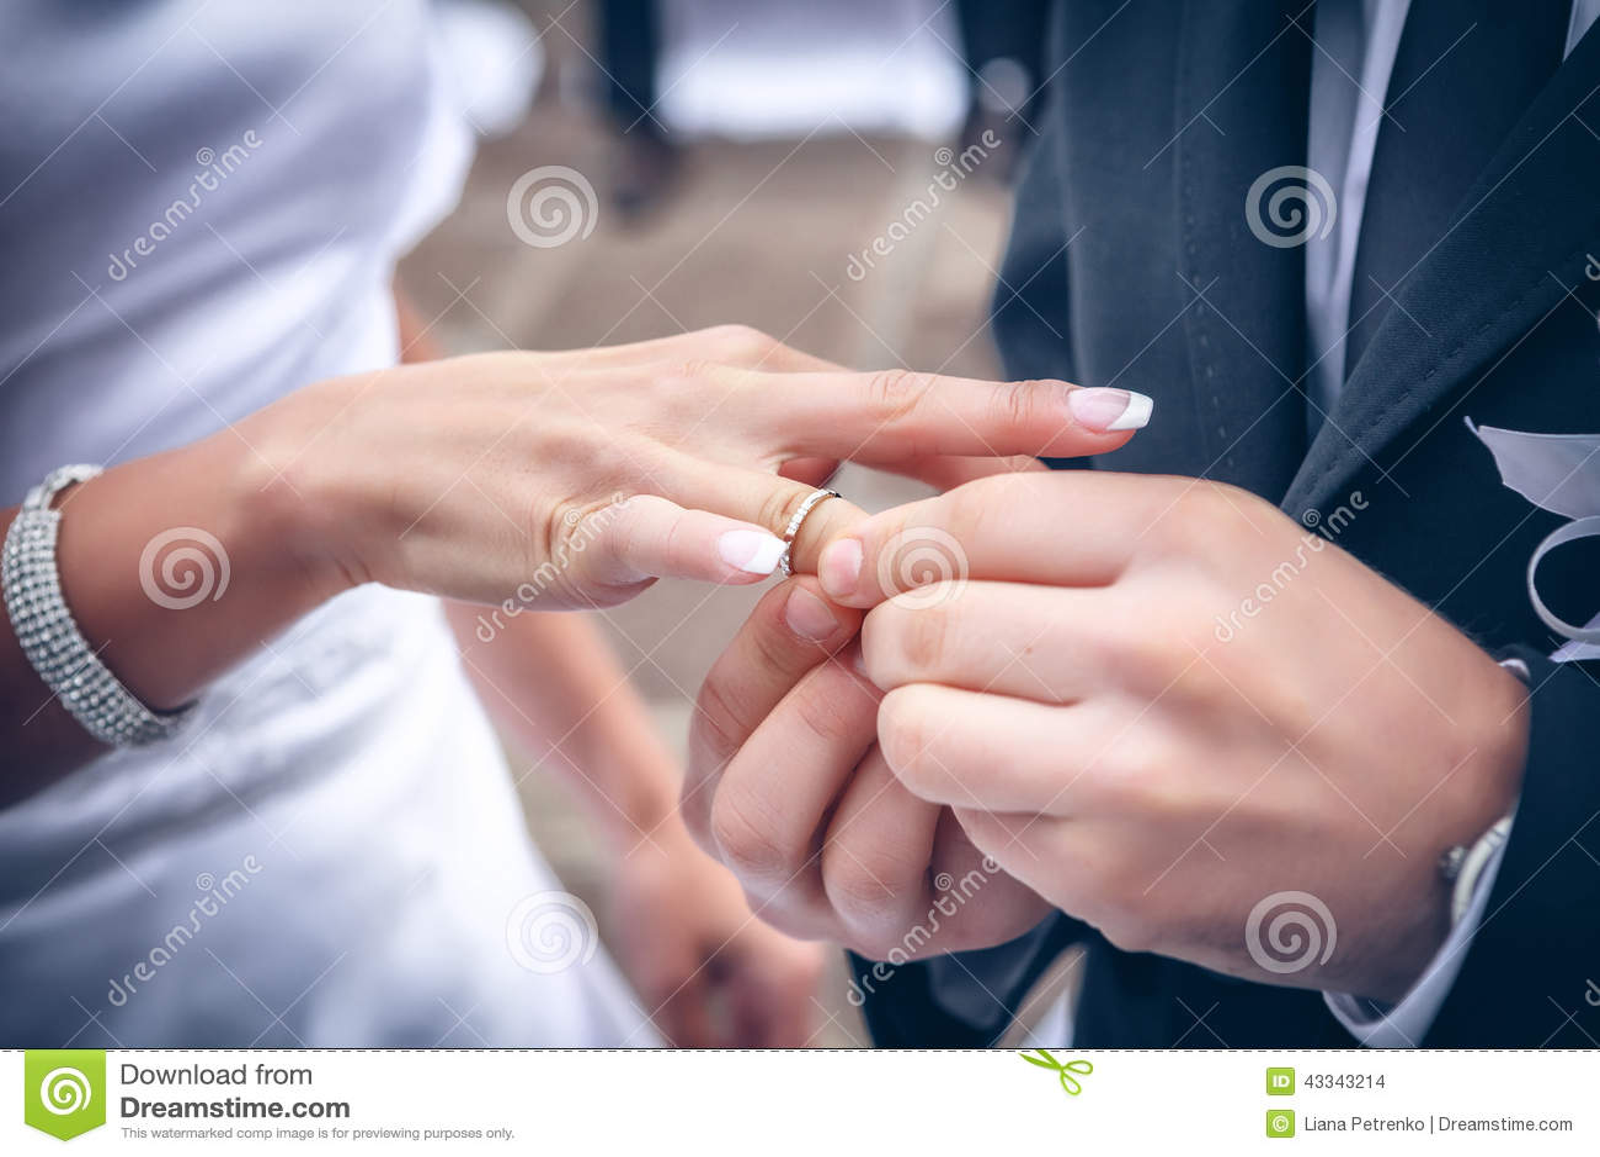 Wedding ring exchange stock photo. Image of wife, ring - 43343214